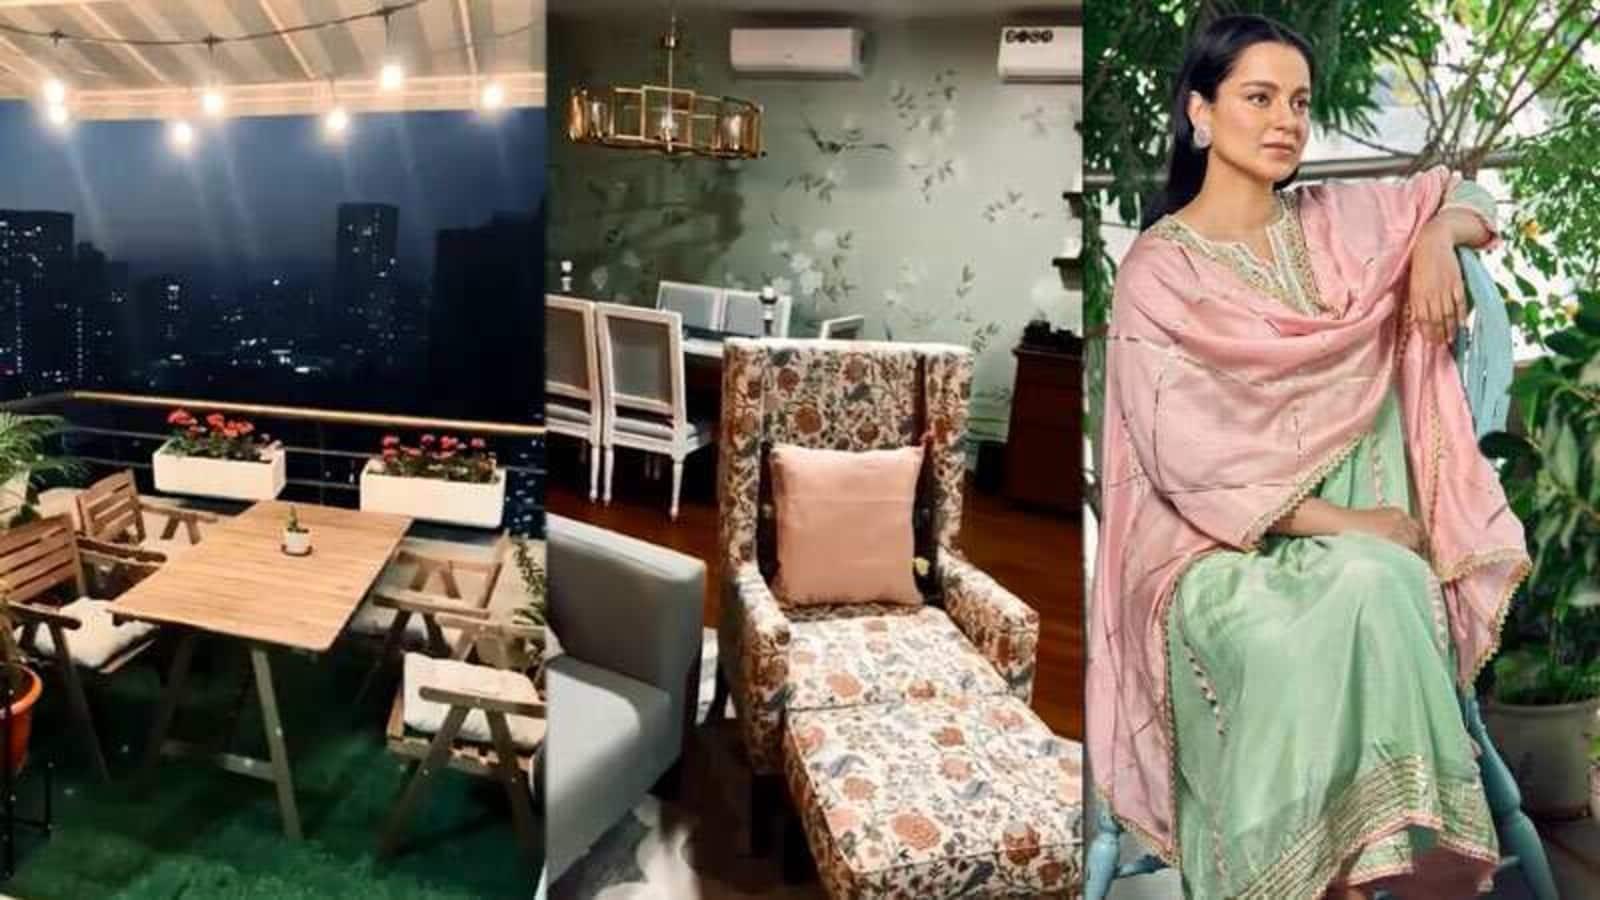 Kangana Ranaut gives parents' Mumbai home a makeover, shares before and after look